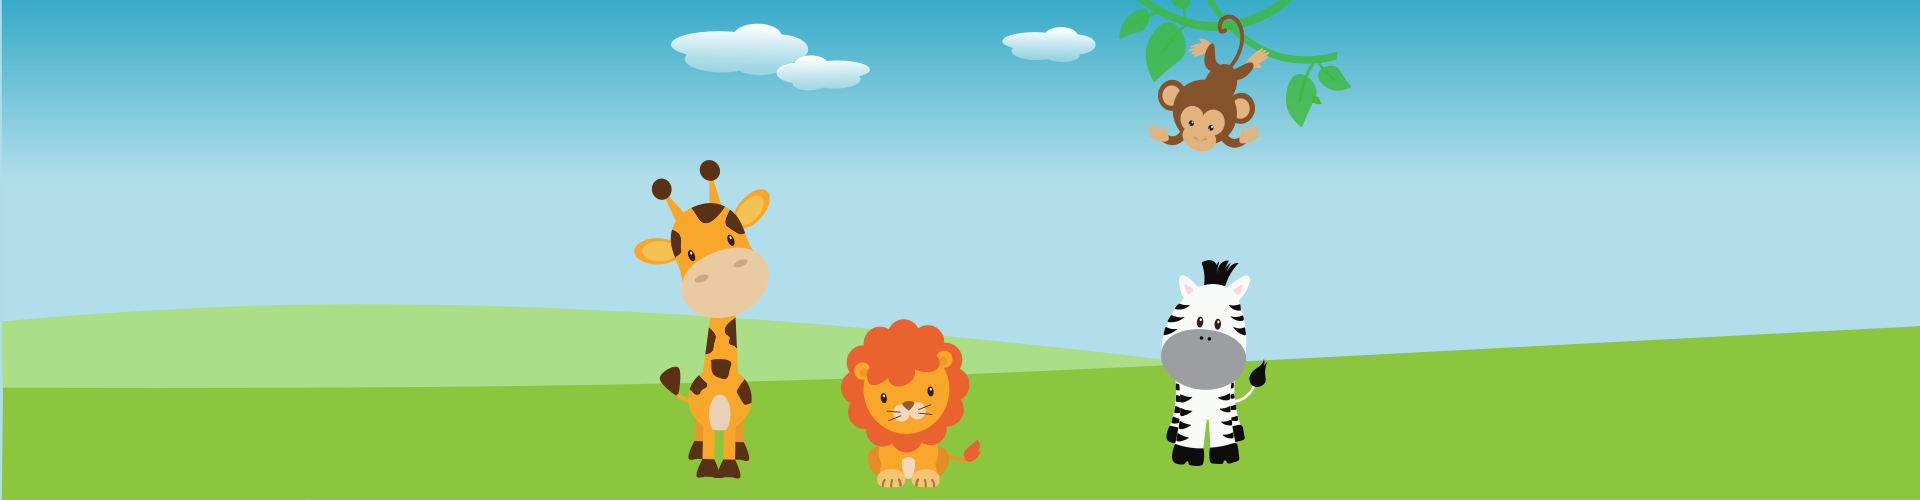 speurtocht safari kinderfeestje